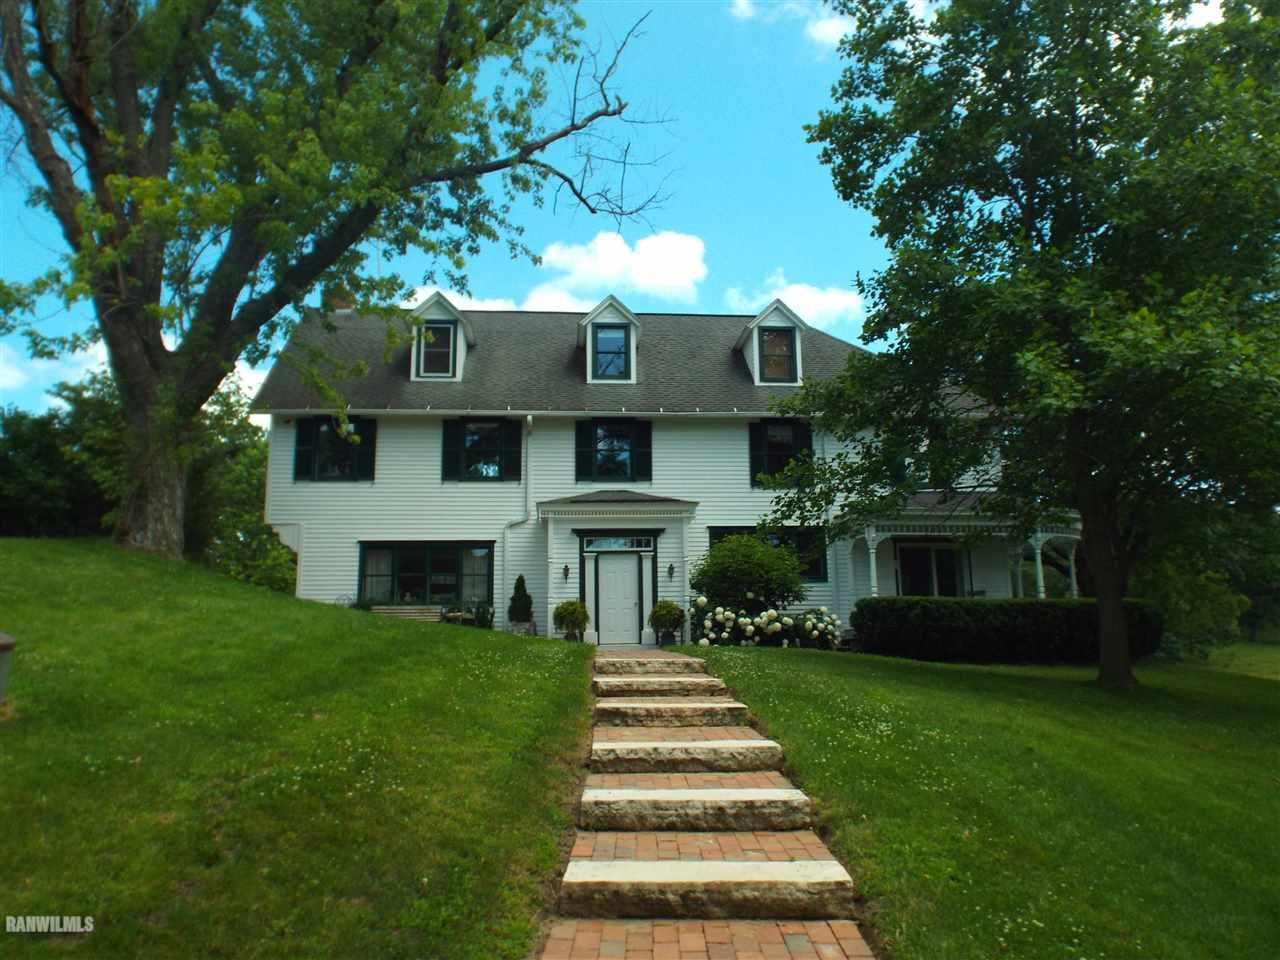 Image of  for Sale near Elizabeth, Illinois, in Jo Daviess County: 87.96 acres